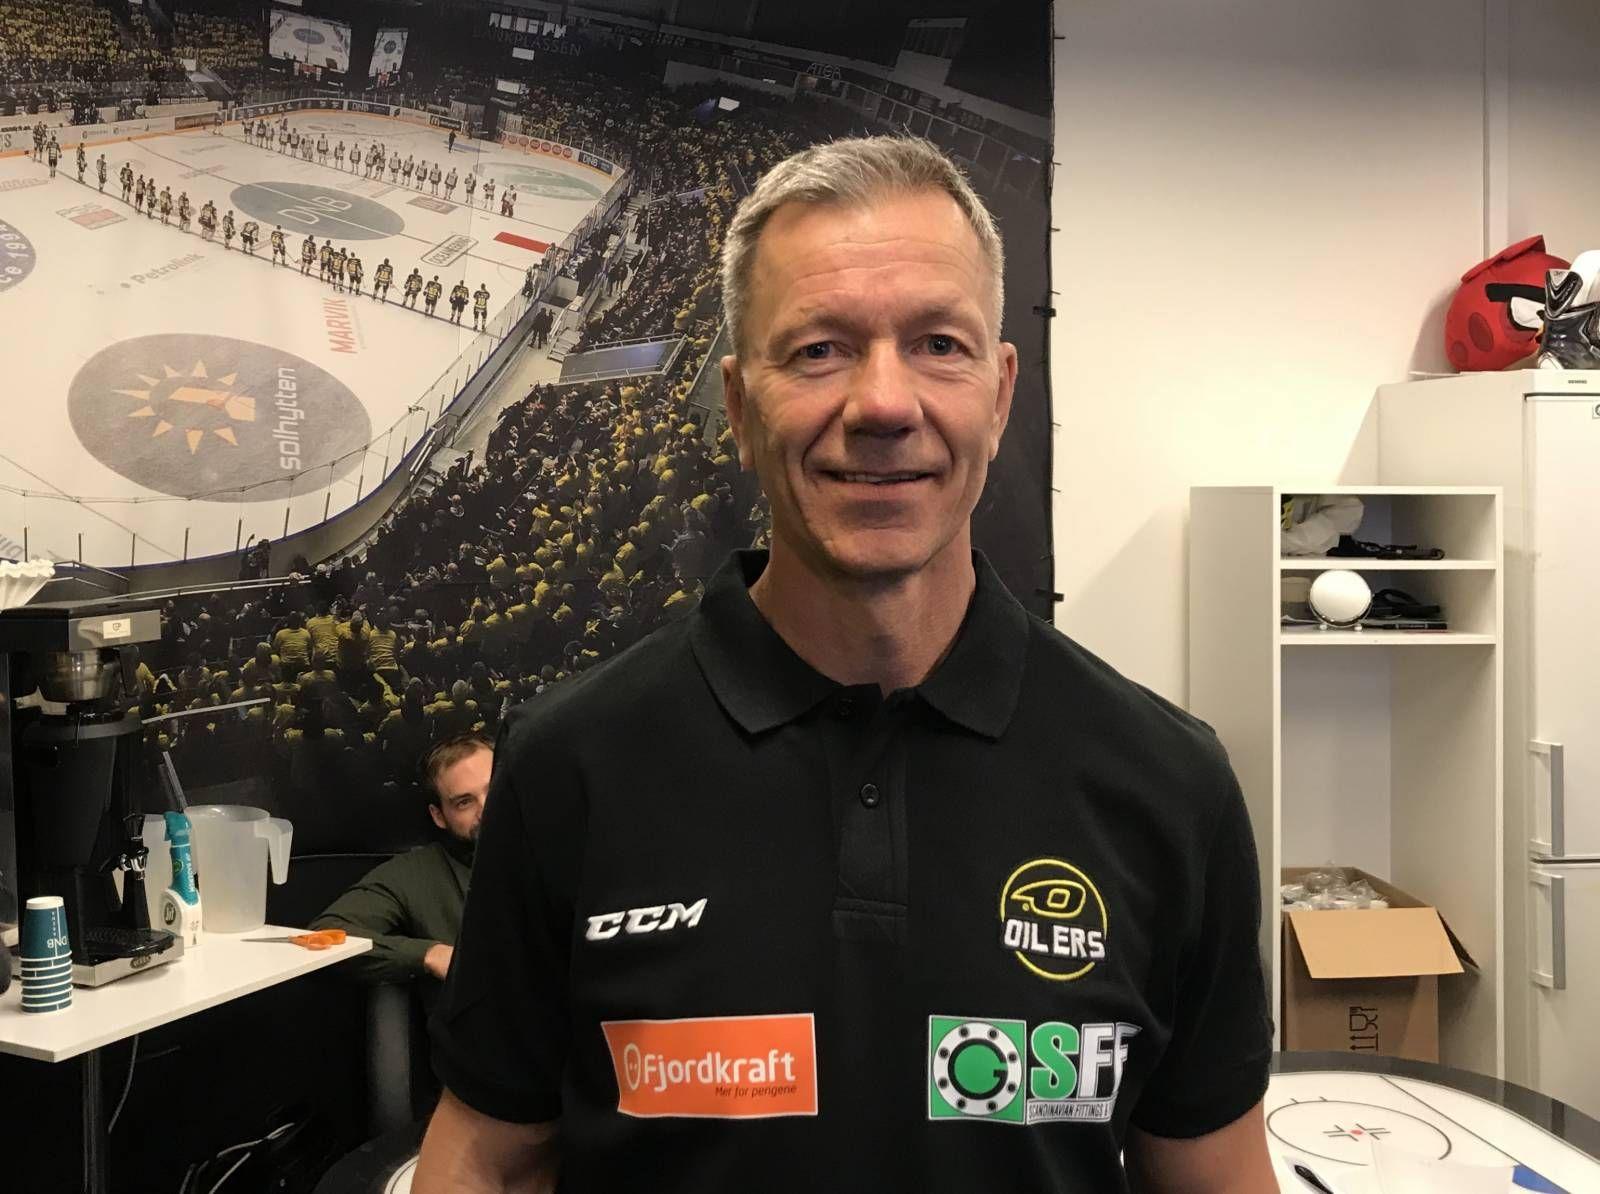 SJEFEN: Todd Bjorkstrand tar over Stavanger Oilers.